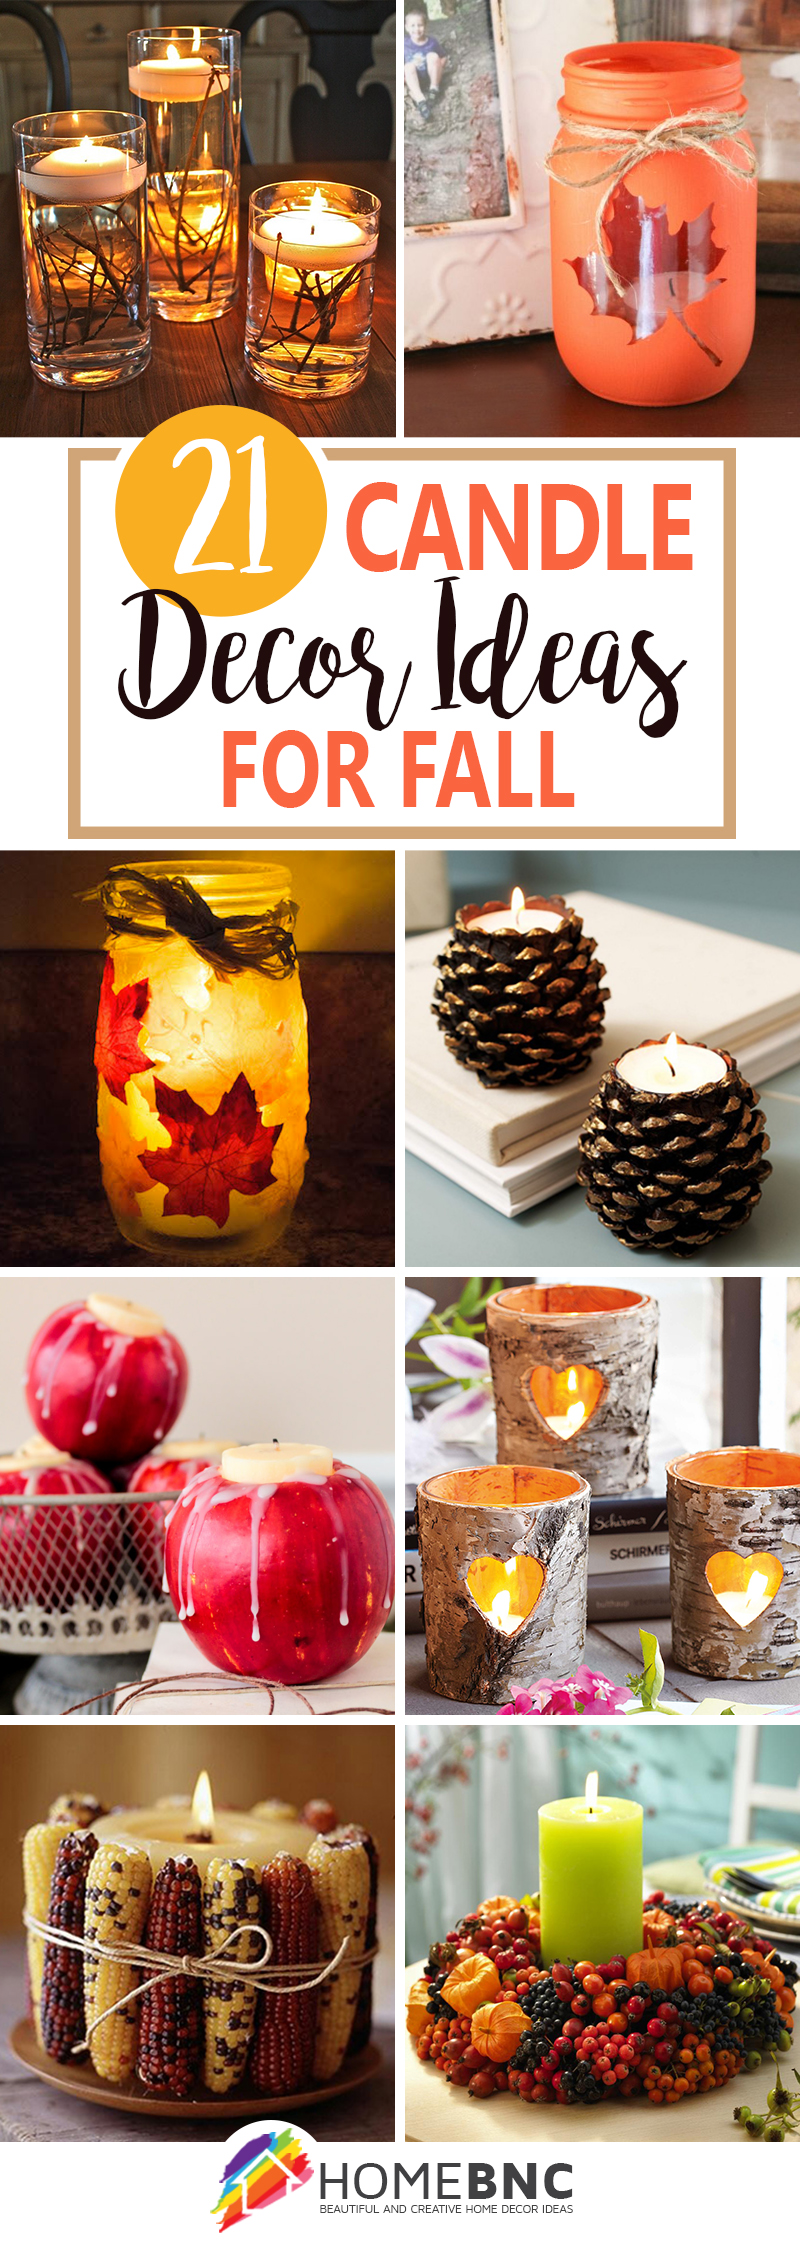 fall-candle-decoration-ideas-pinterest-share-homebnc-4